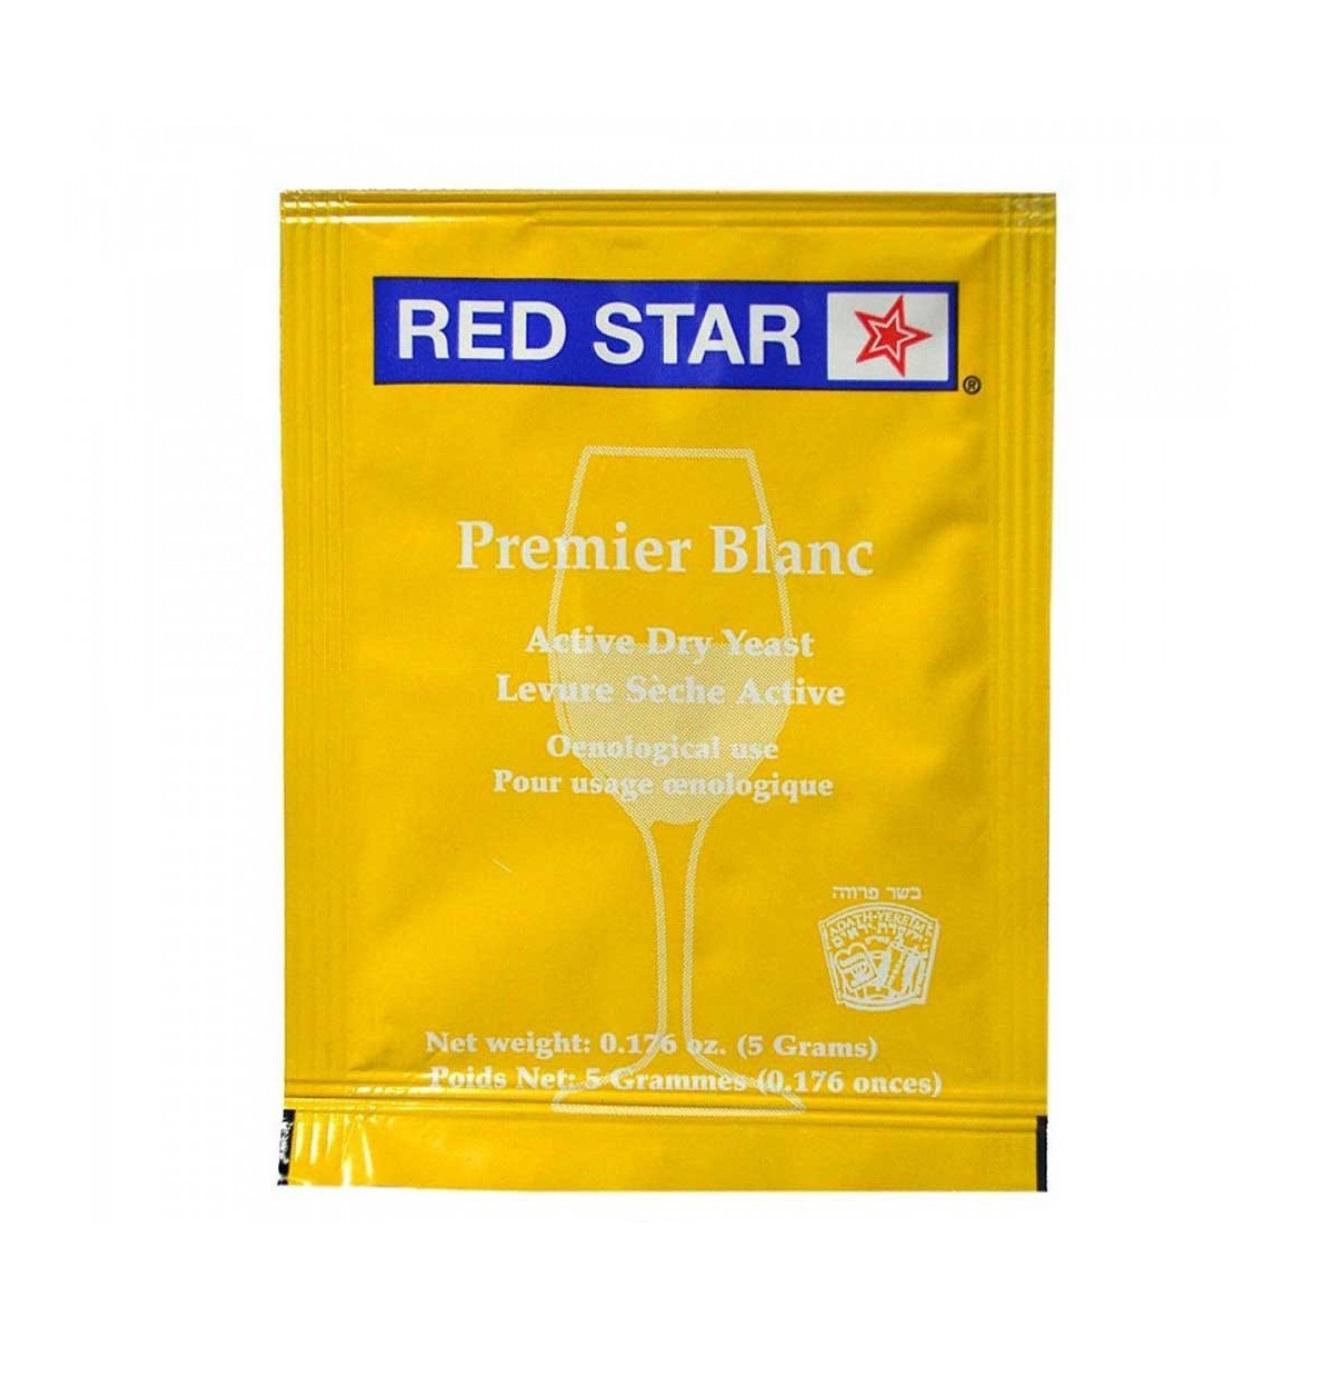 Fermento Red Star Premier Blanc (Pasteur Champagne) - 5g